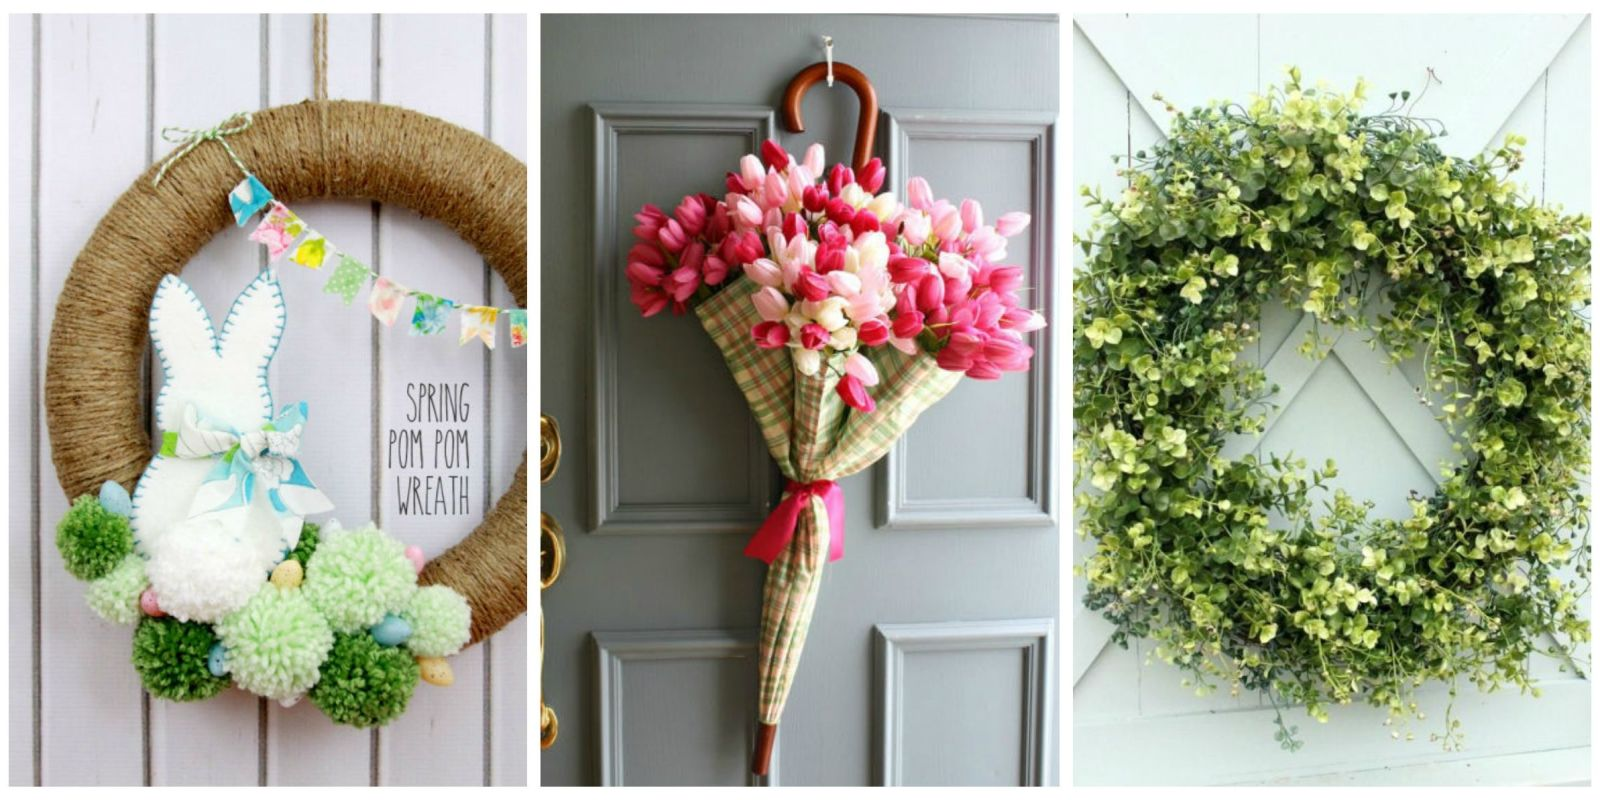 Amazing Diy Wreaths To Dress Up Your Door This Spring Diycraftsguru